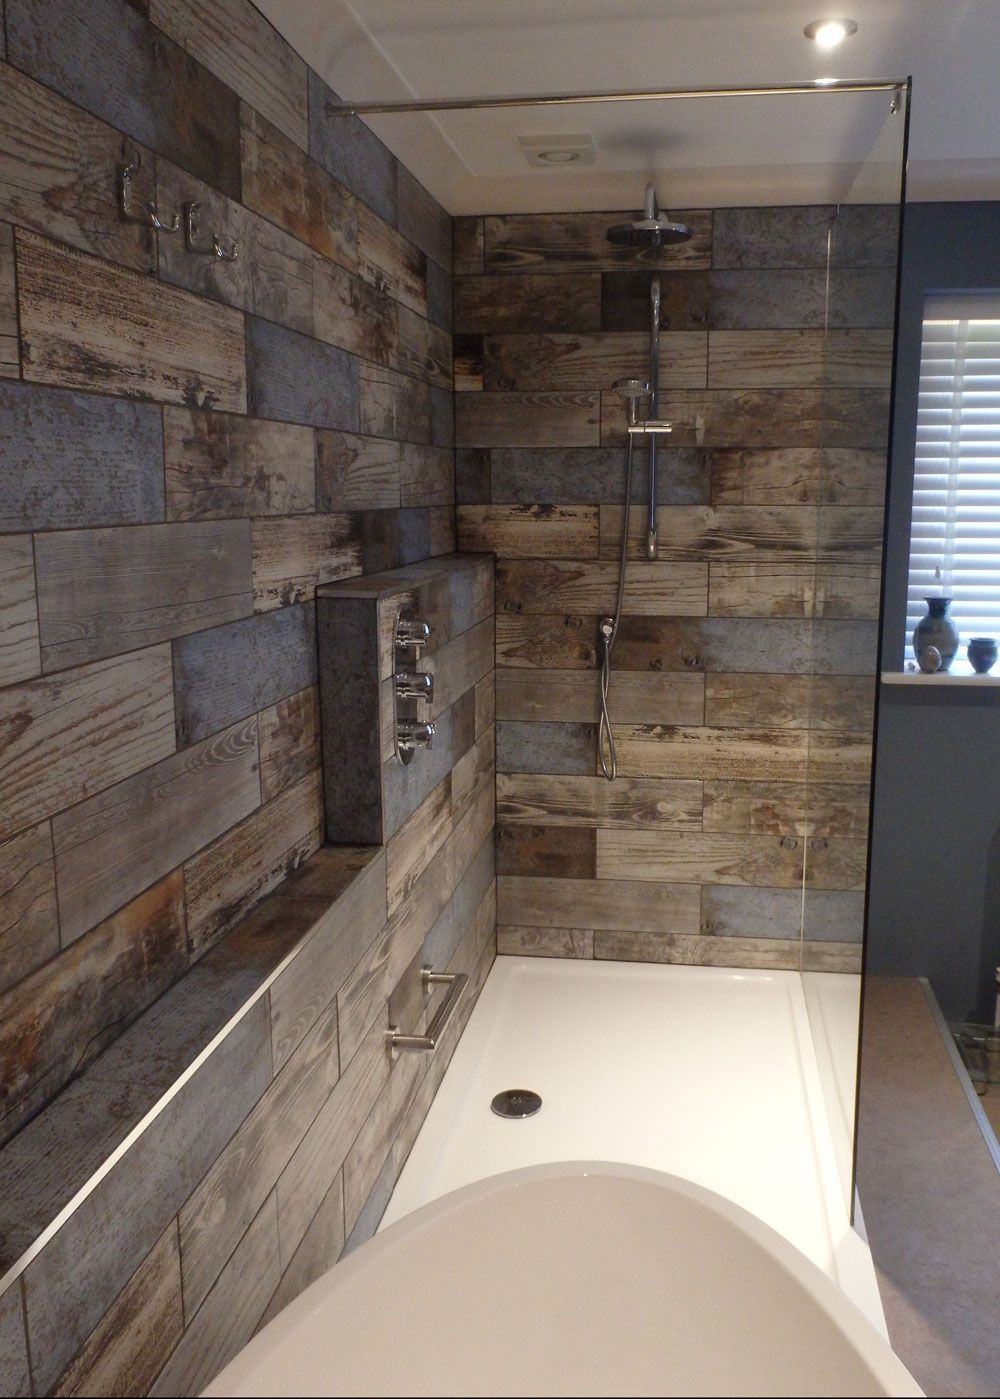 31 Bathroom Tile Ideas Make It Fresh And Not Boring Wood Tile Shower Wood Tile Bathroom Wooden Bathroom